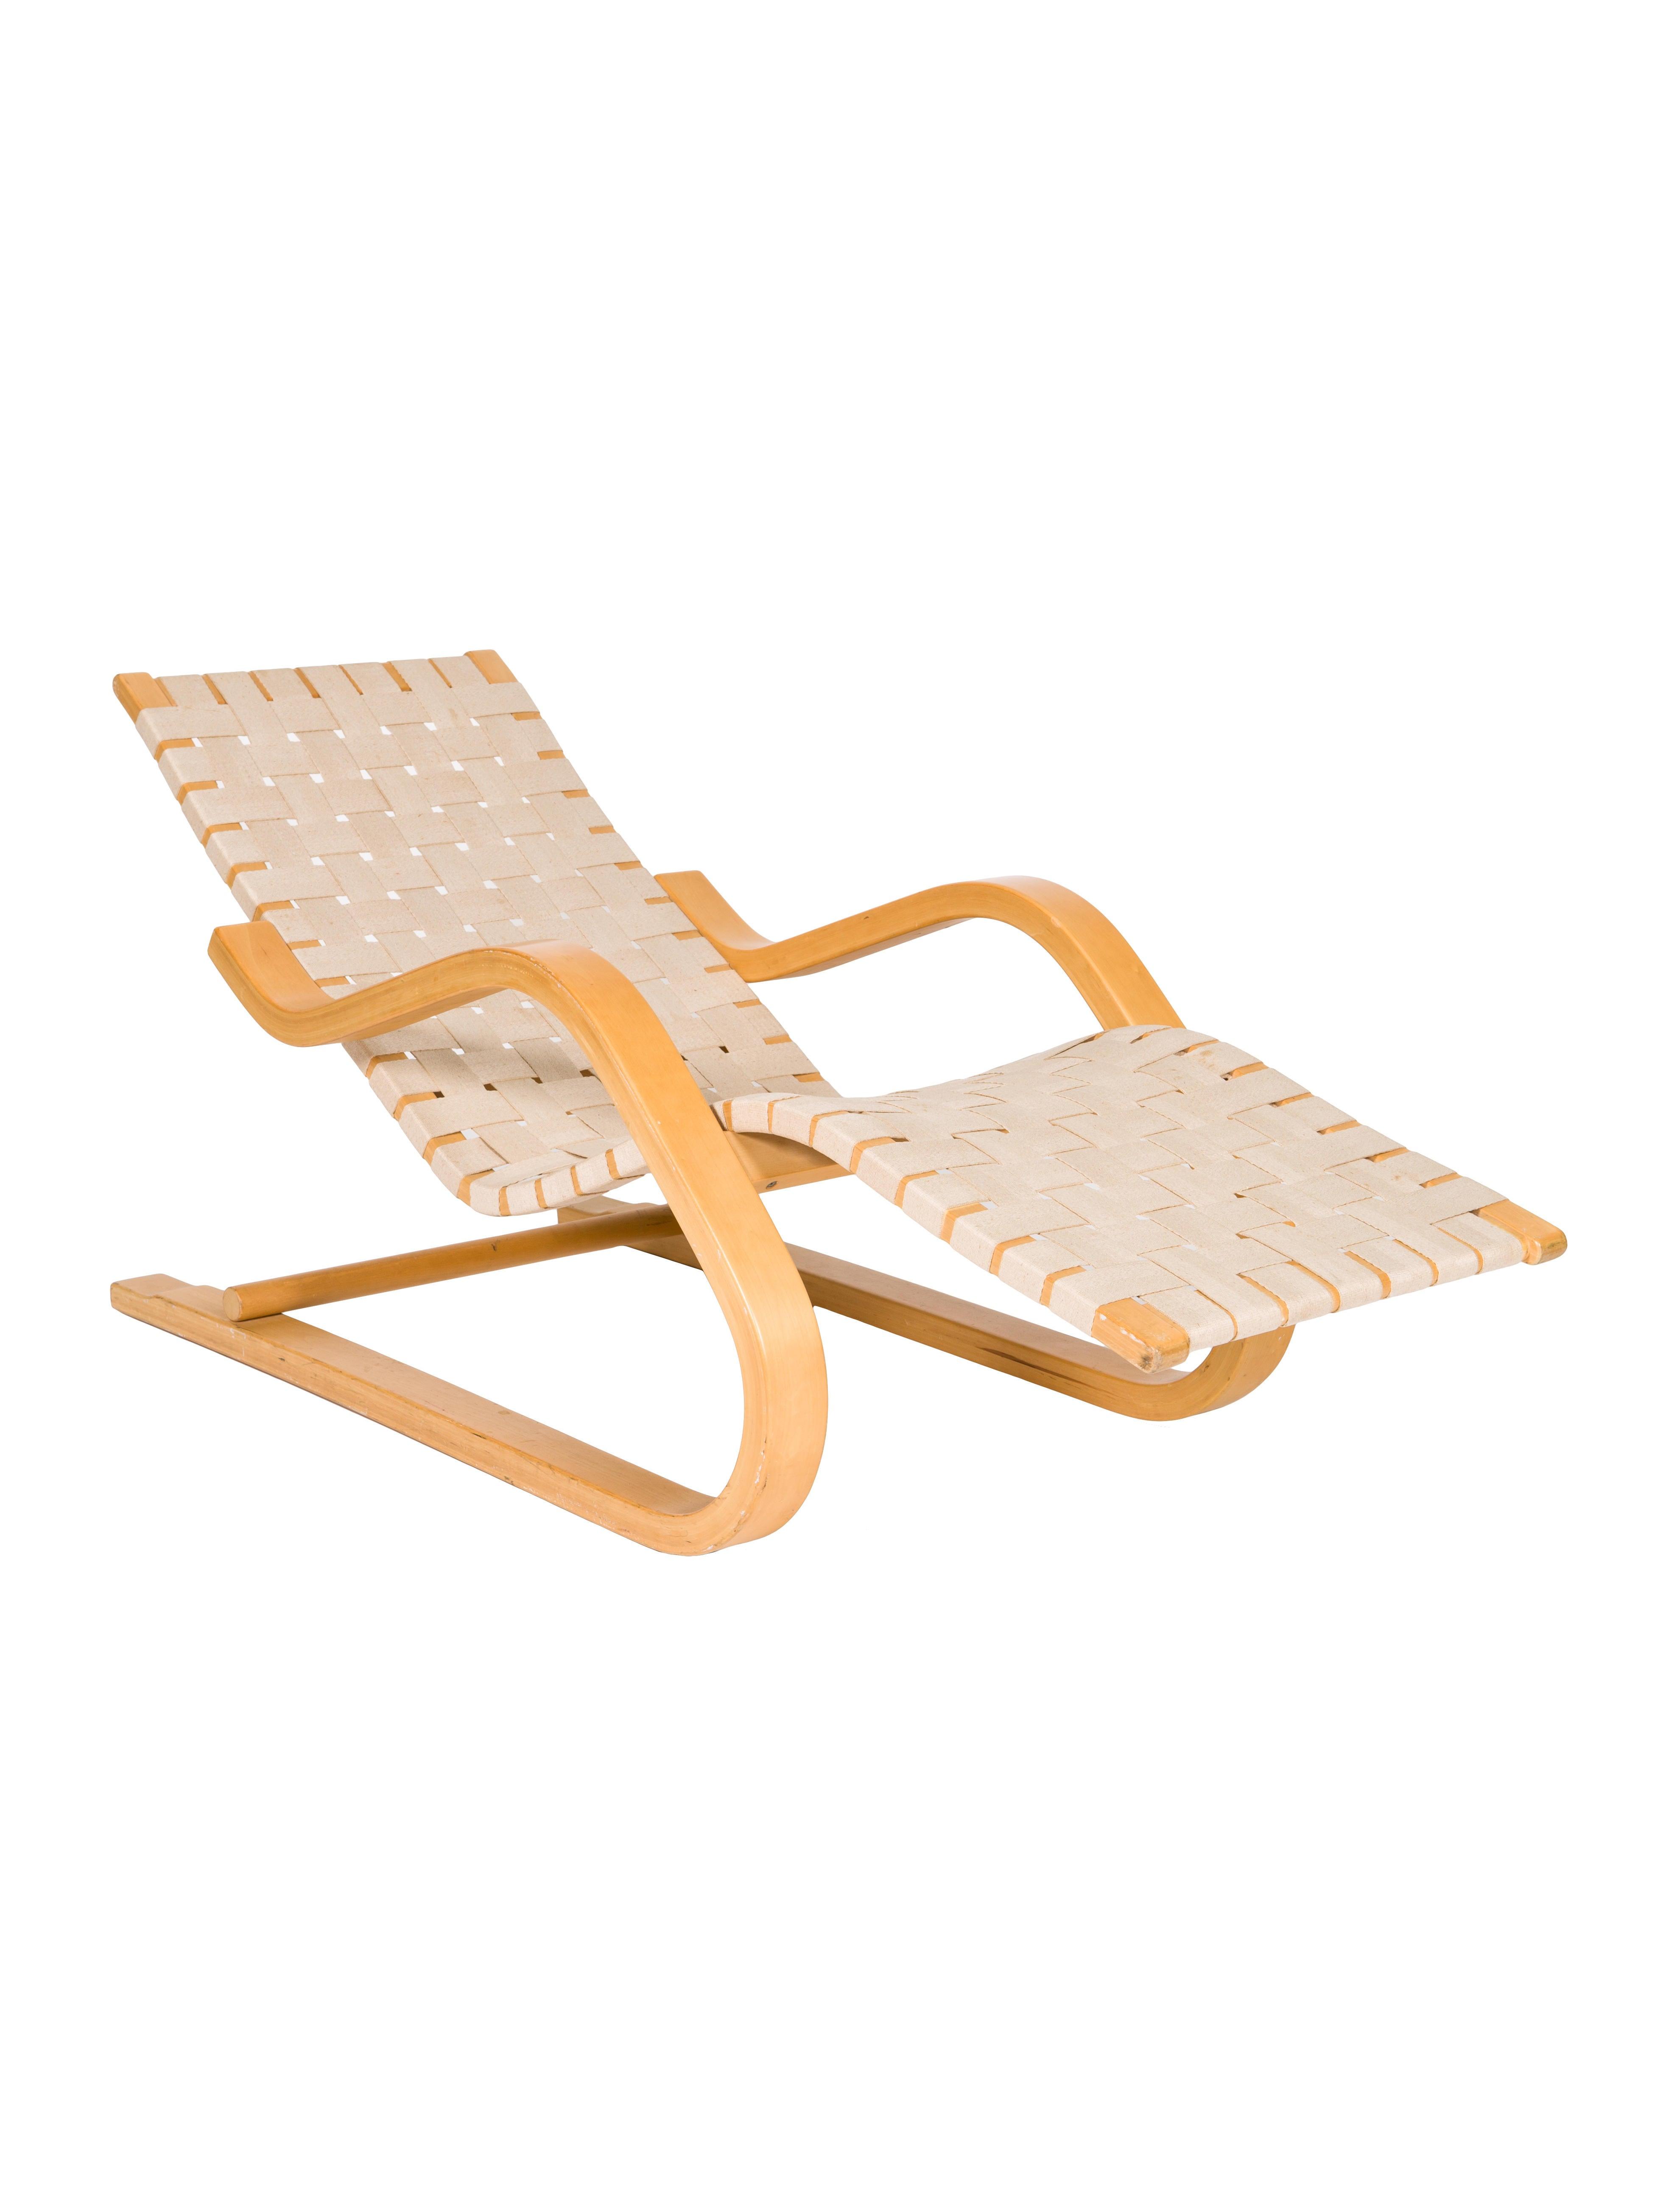 Alvar Aalto Lounge Chair Furniture Ava20006 The Realreal